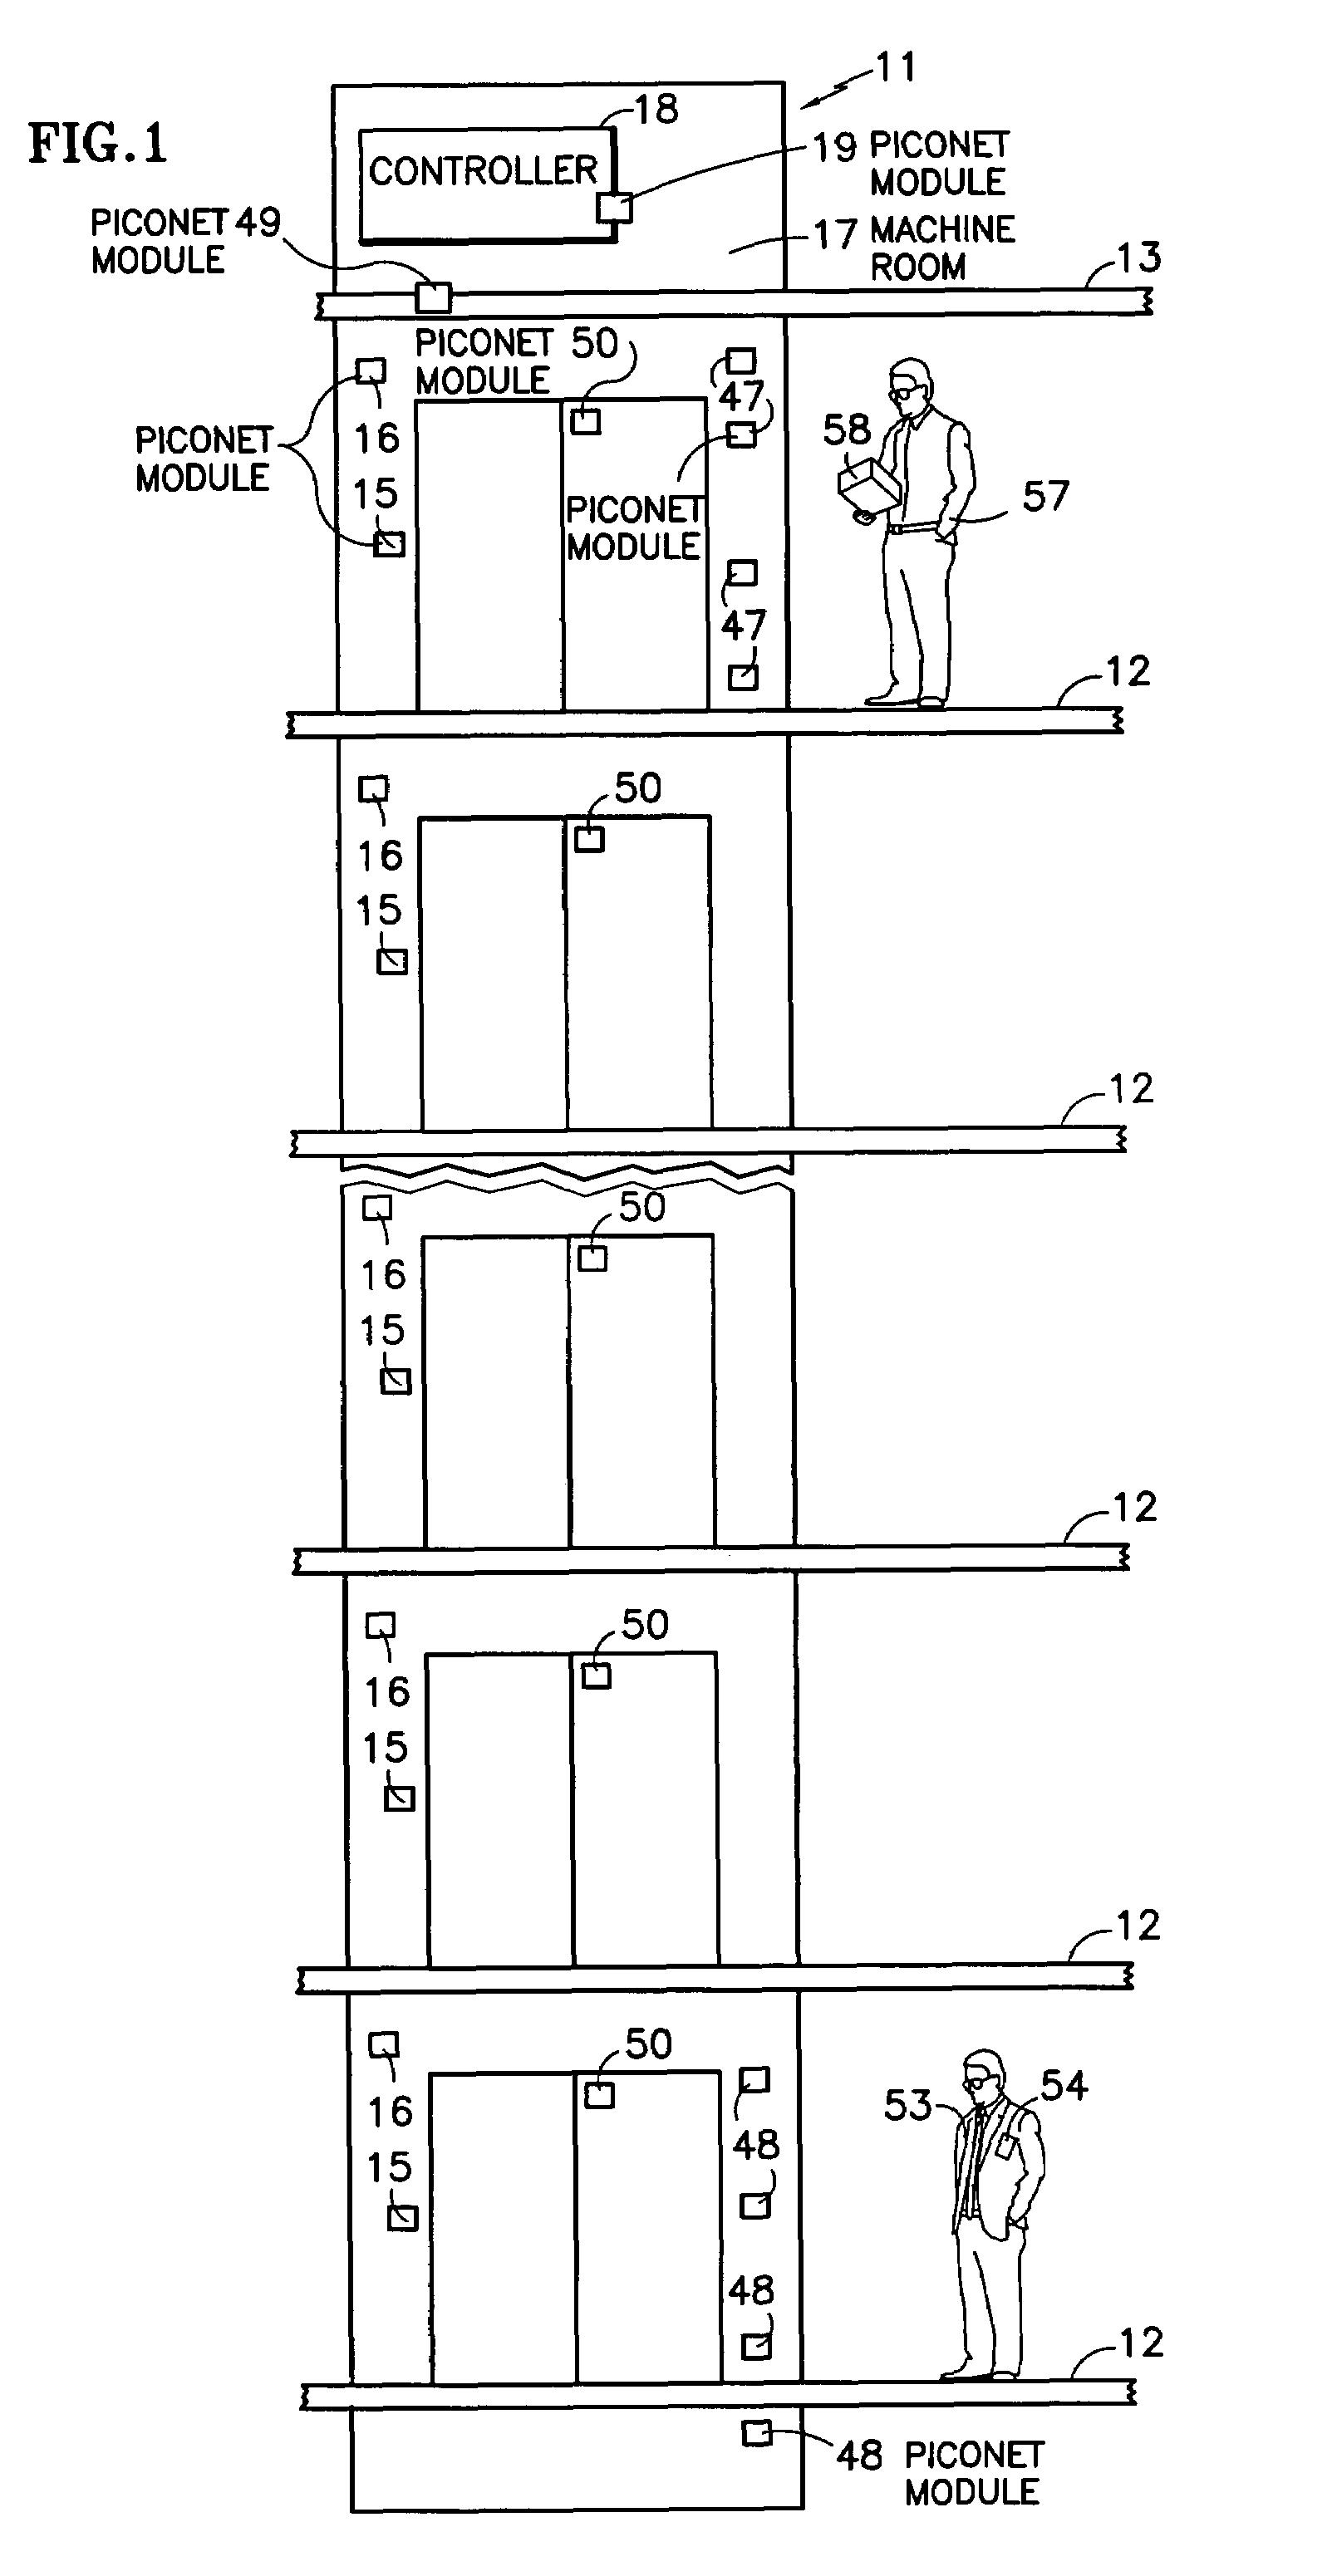 patent us7426981 - elevator wireless communication infrastructure using piconet modules